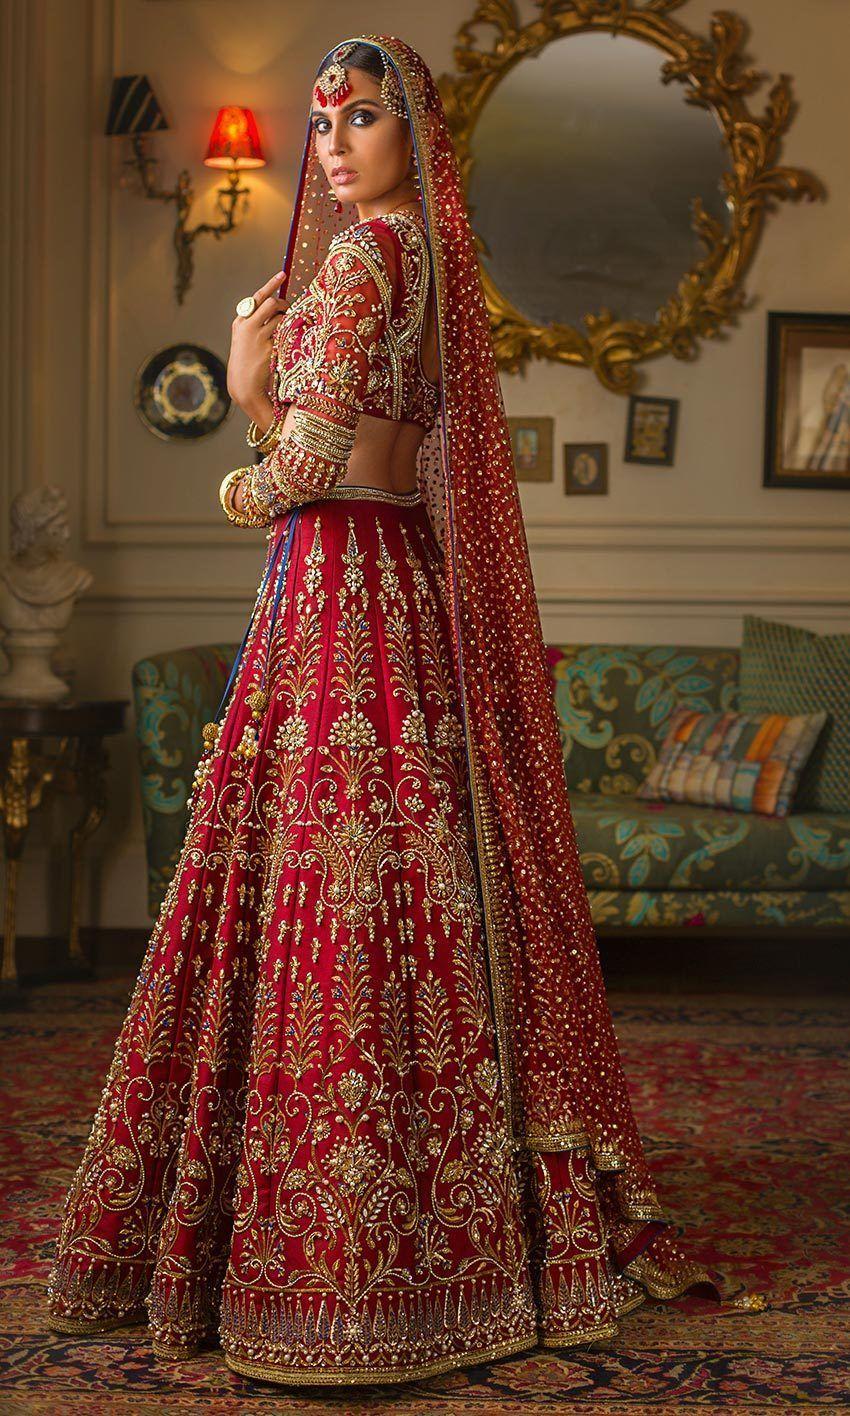 1 New Message Indian Wedding Dress Bridal Lehenga Red Bridal Dress Indian Bridal Lehenga [ 1416 x 850 Pixel ]